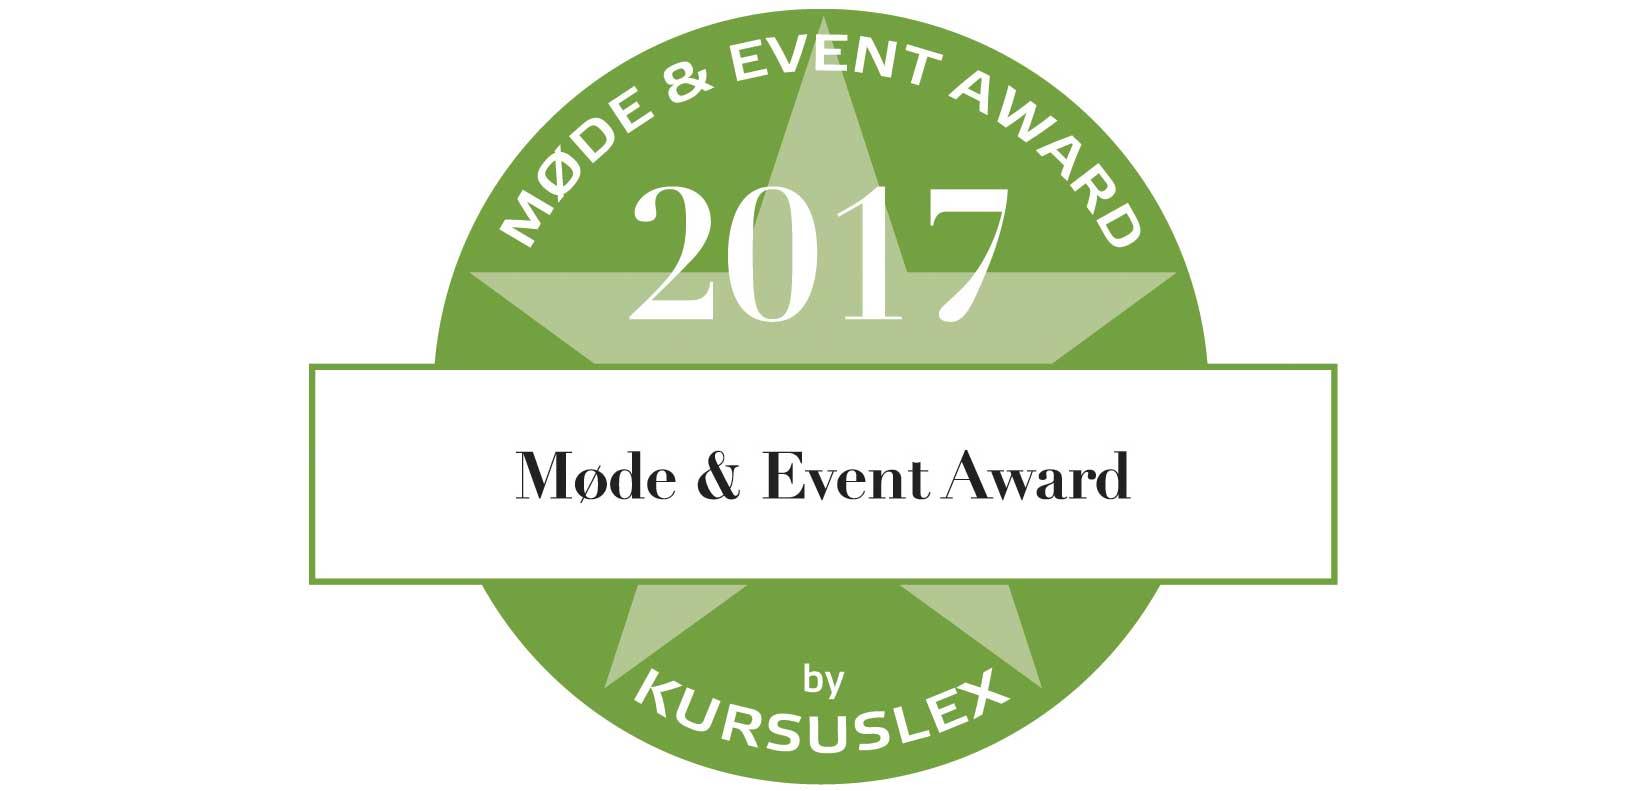 Møde & Event Award 2017